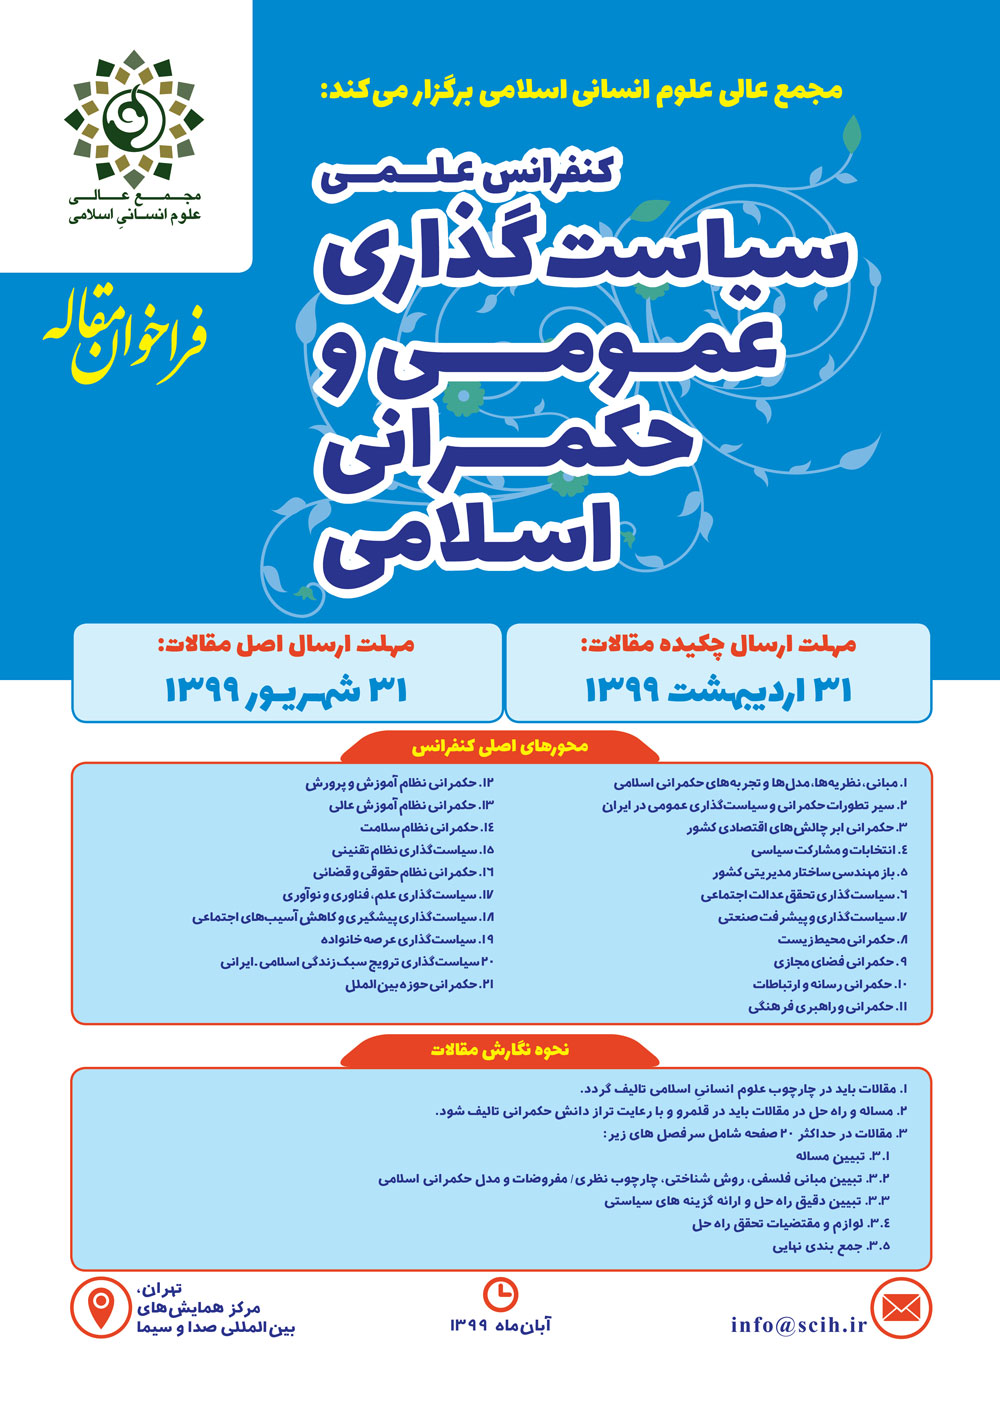 poster final9812211 - کنفرانس علمی سیاستگذاری عمومی و حکمرانی اسلامی برگزار میشود